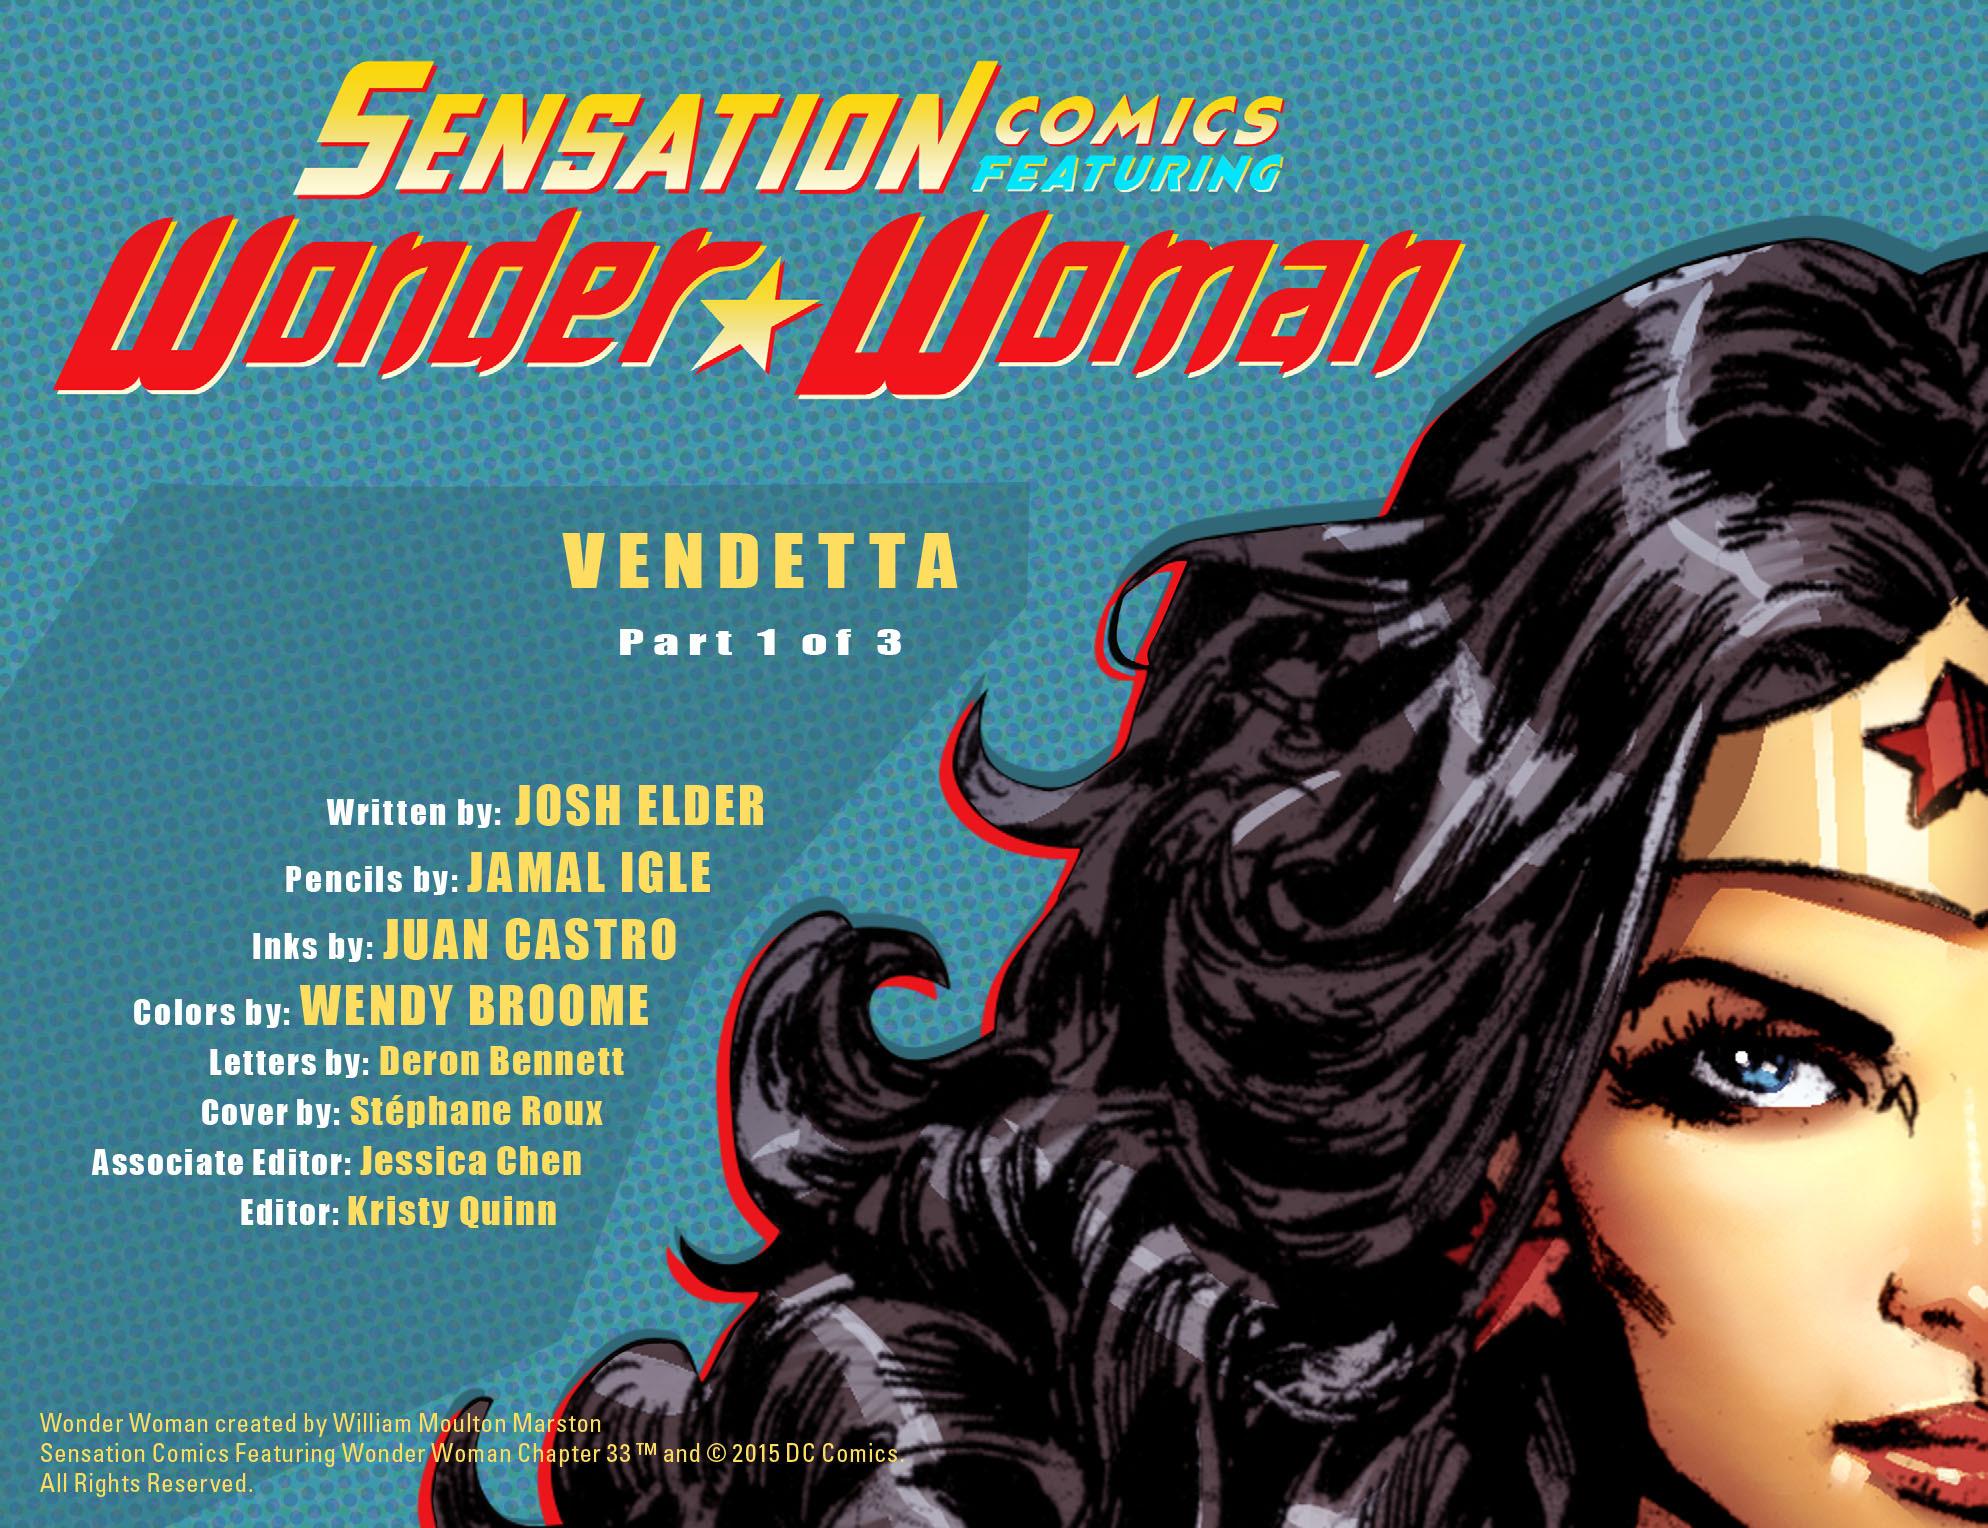 Read online Sensation Comics Featuring Wonder Woman comic -  Issue #33 - 2